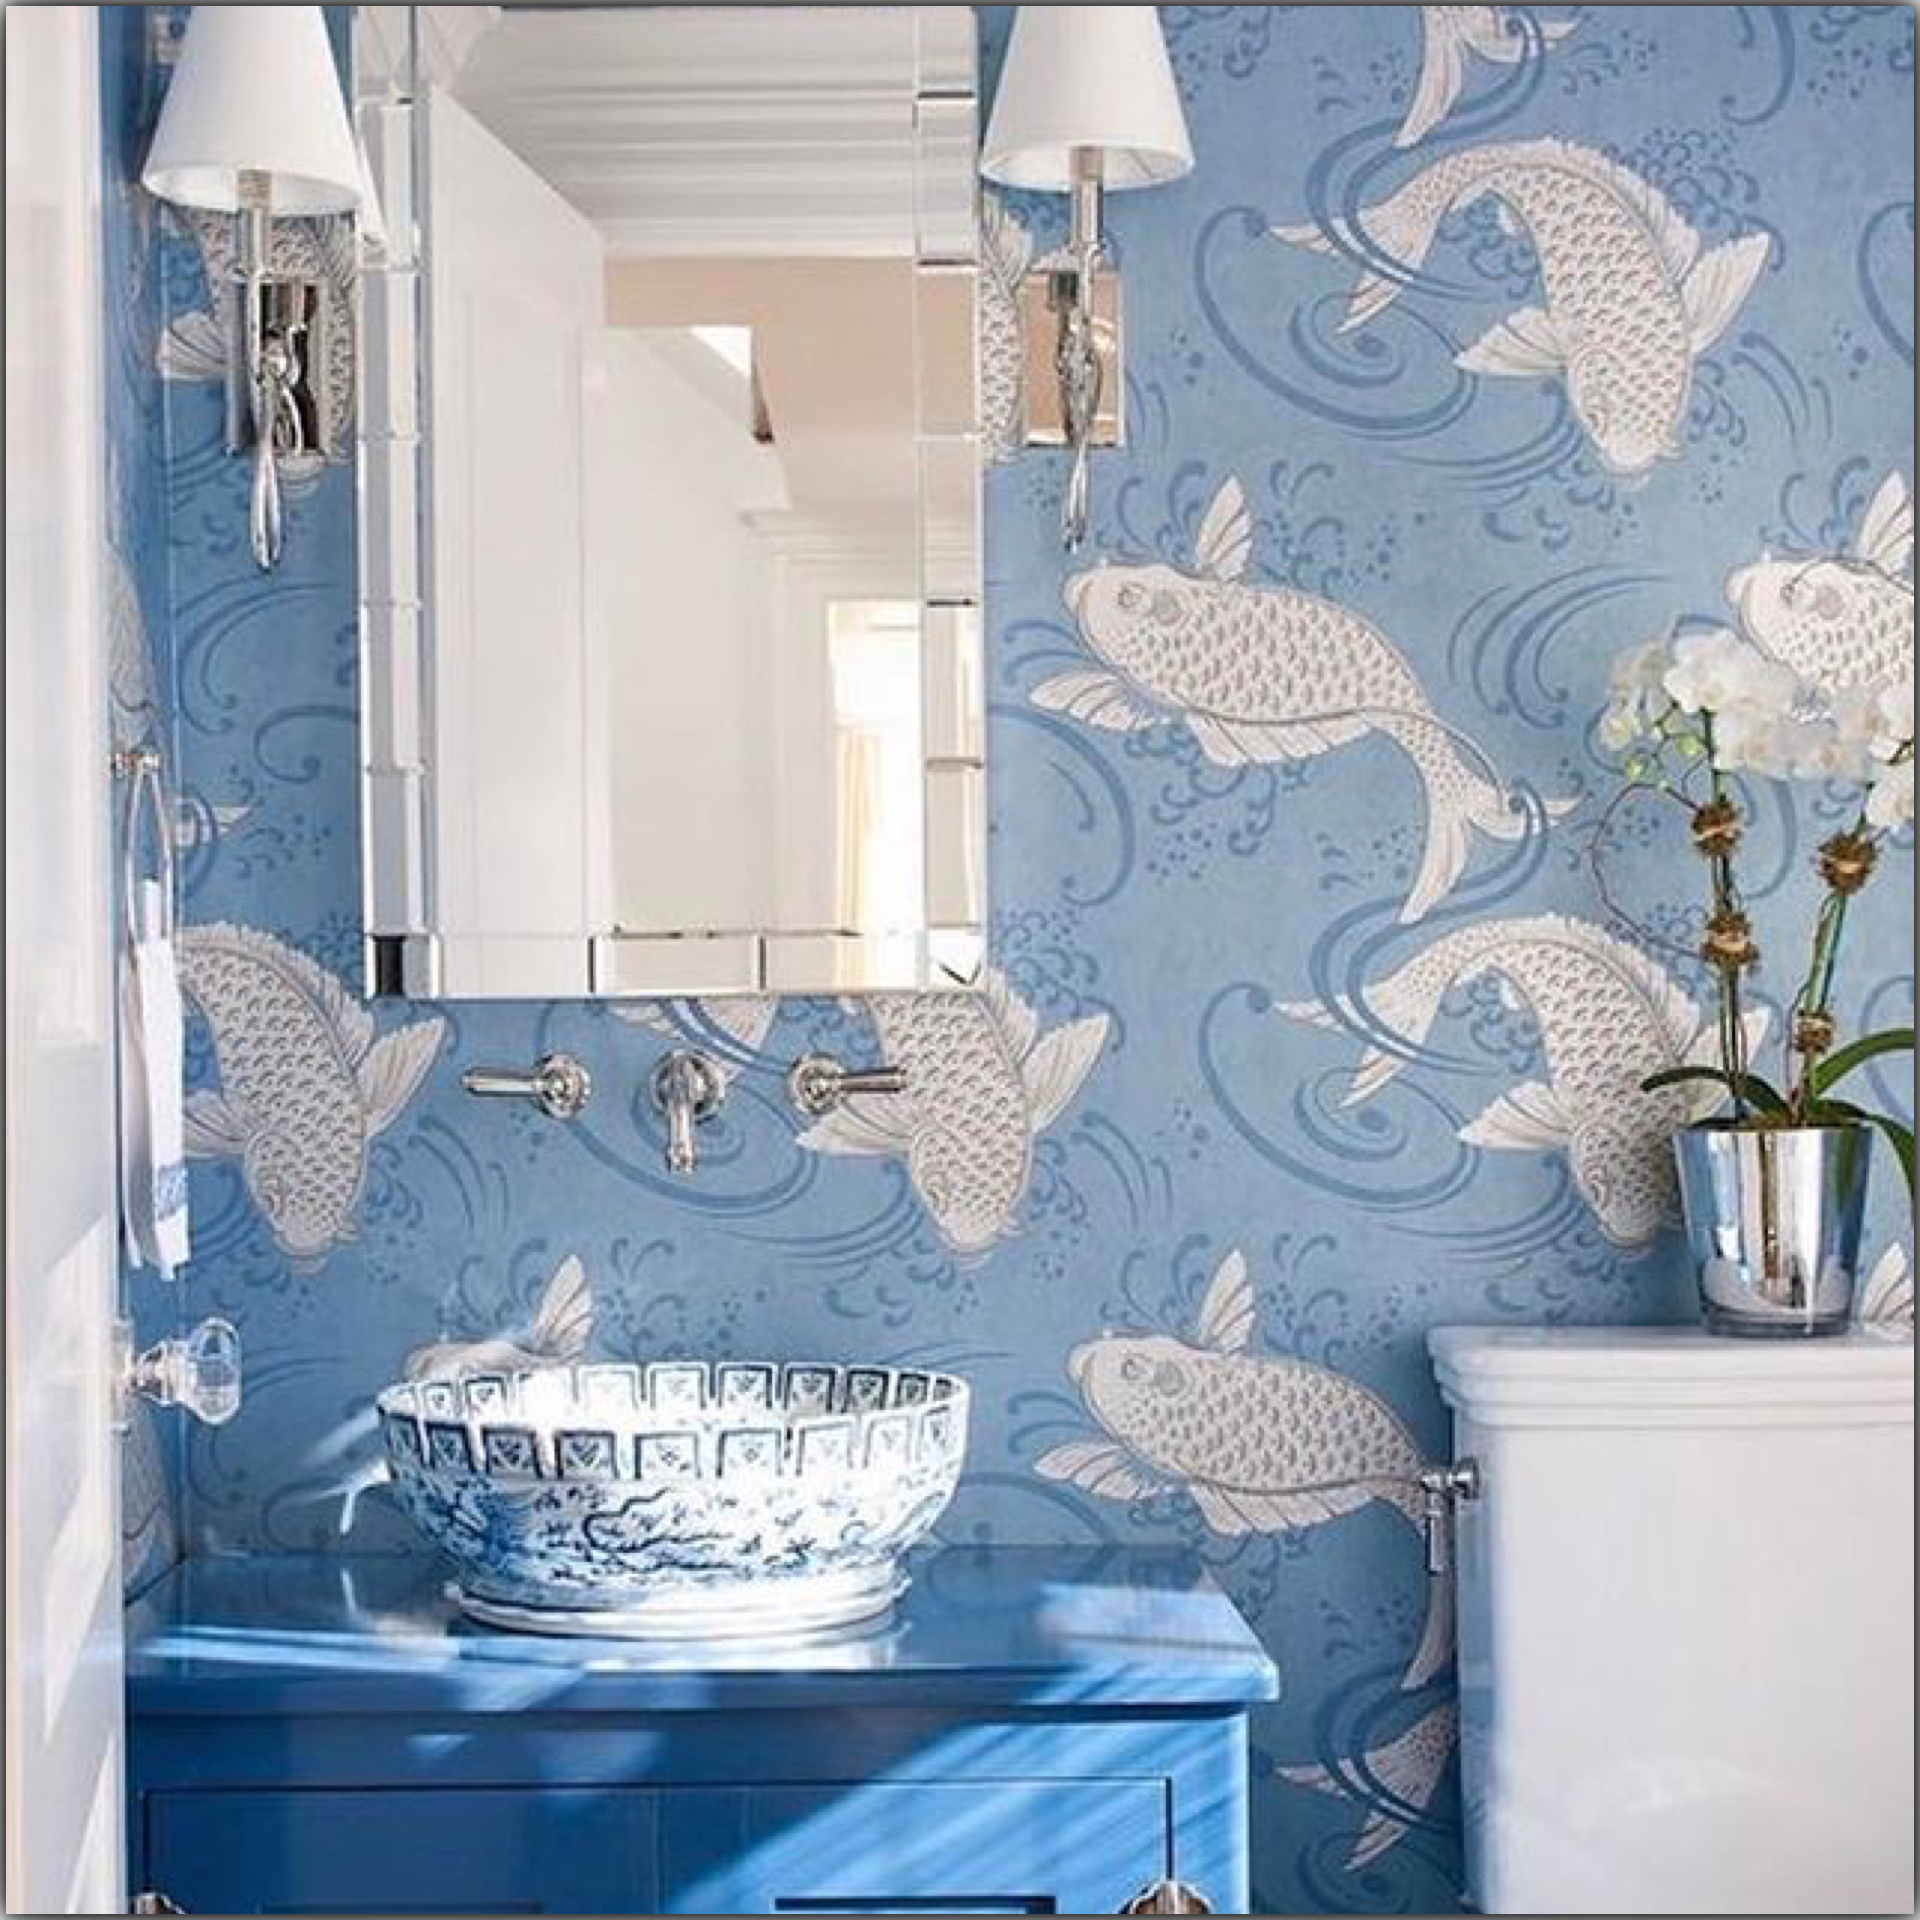 Classichome Interior Design: Pin By Ceylan Y Ksel On BATHROOMS